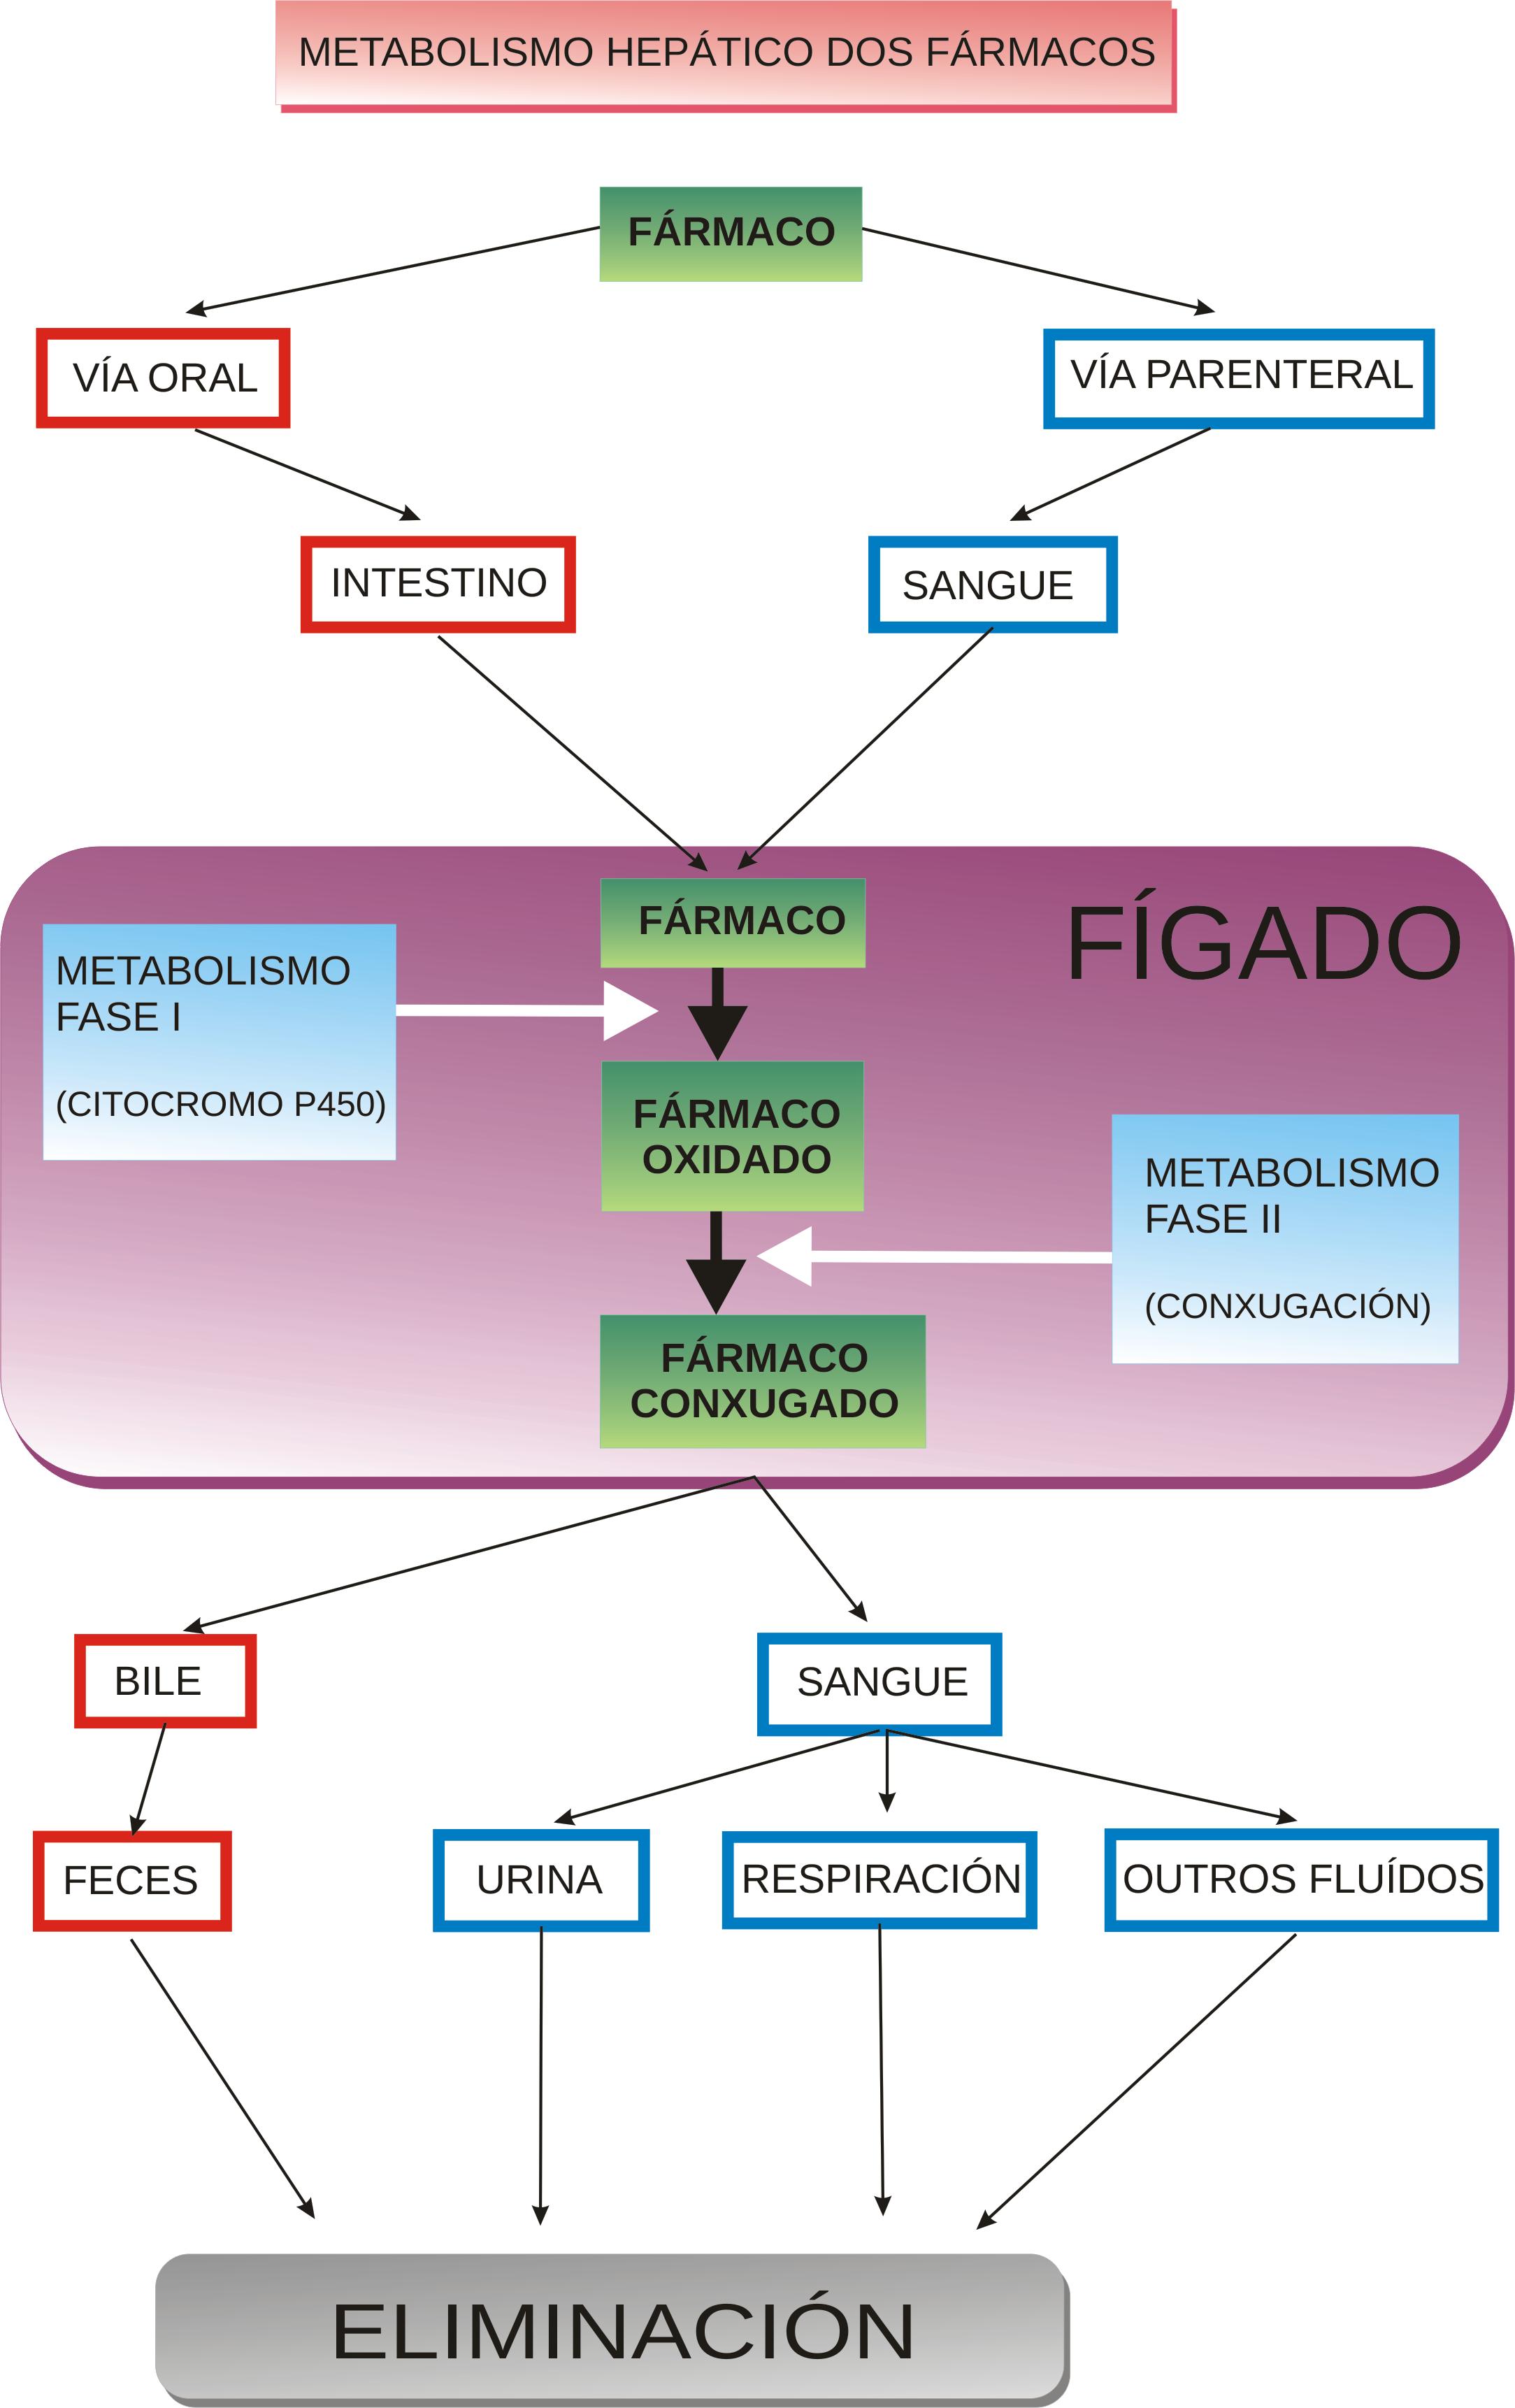 File:Diagrama metabolismo hepático gl.png - Wikimedia Commons